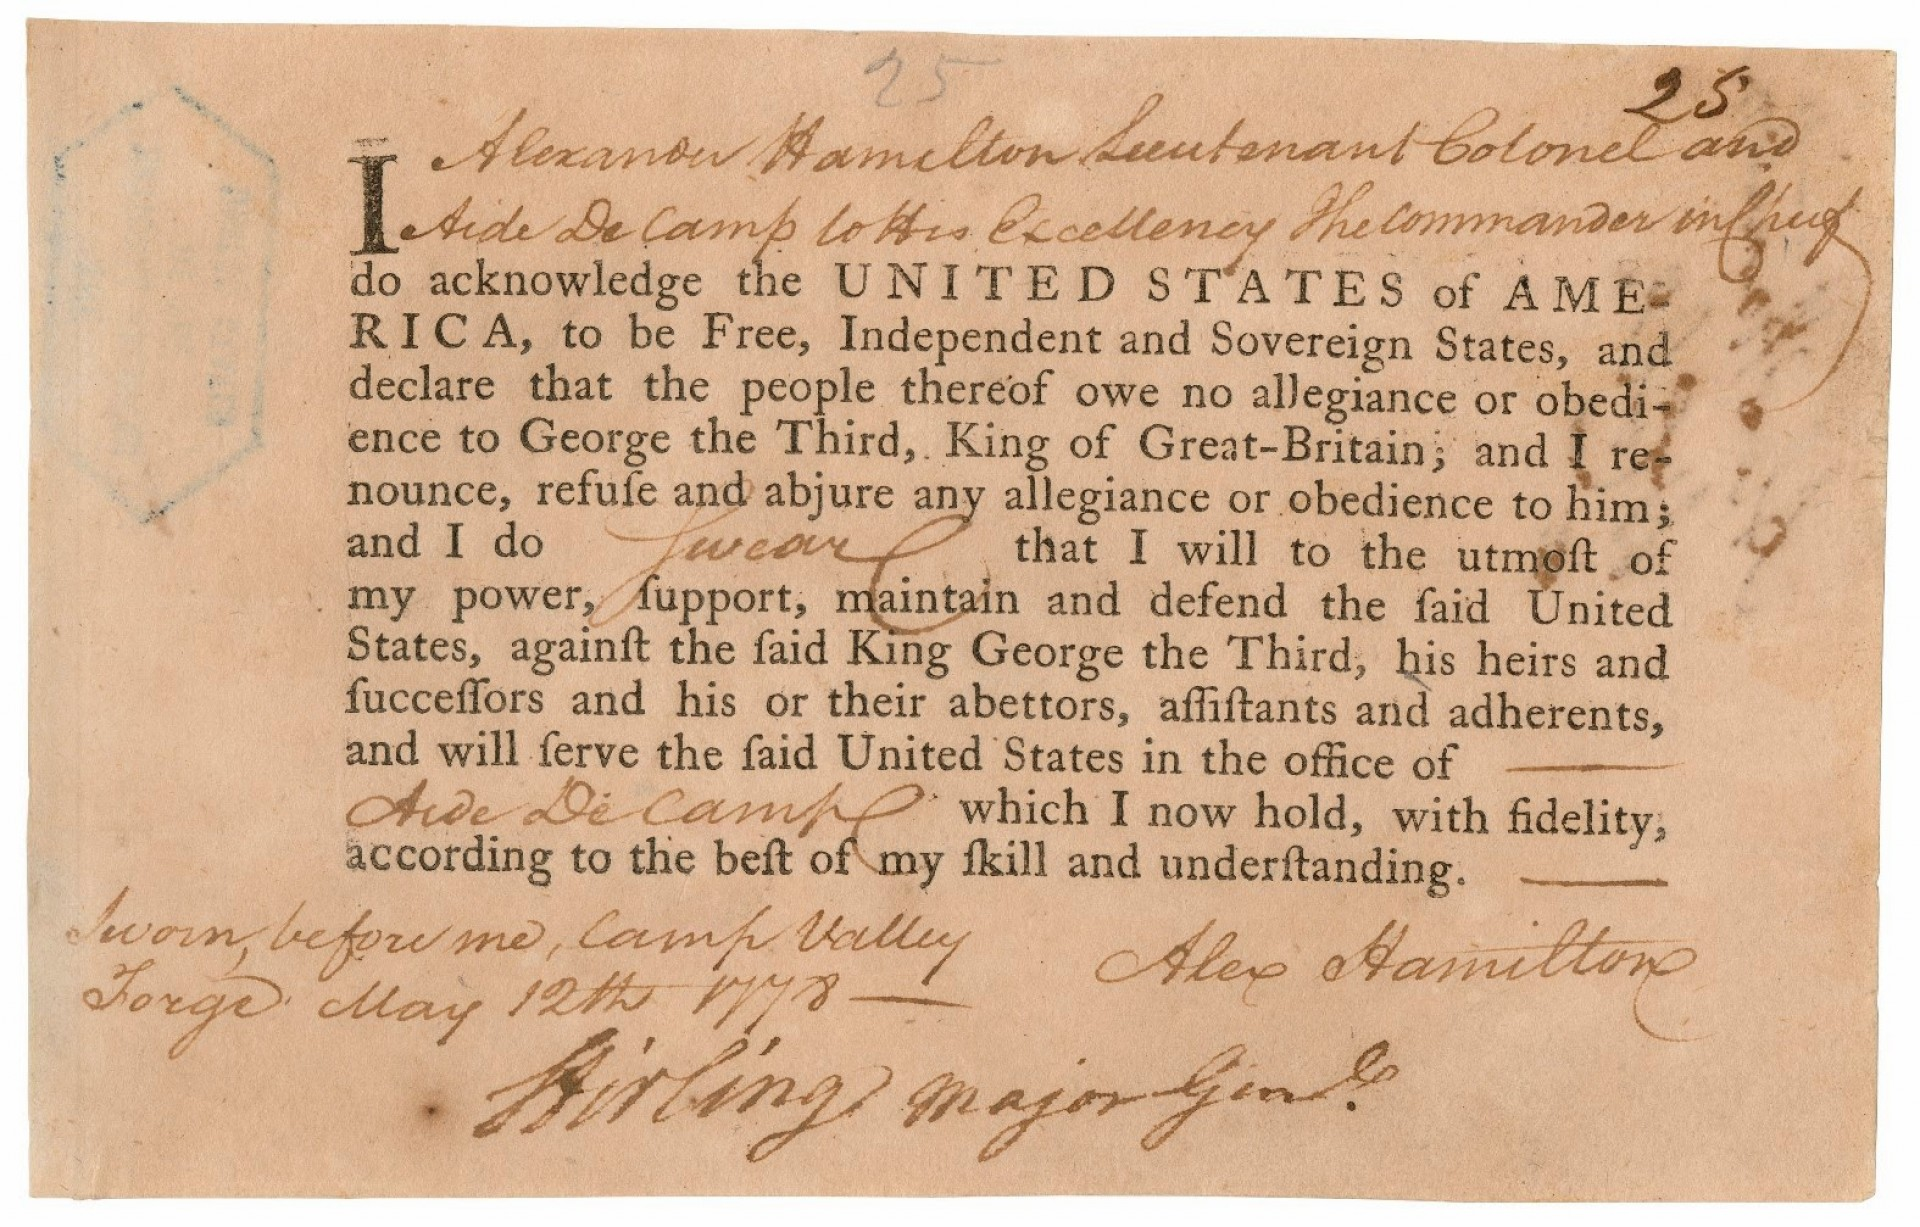 001 Alexanderhamiltonlarge Essay Example Alexander Hamilton Frightening Essays Federalist Papers 1 Pdf Guns 1920